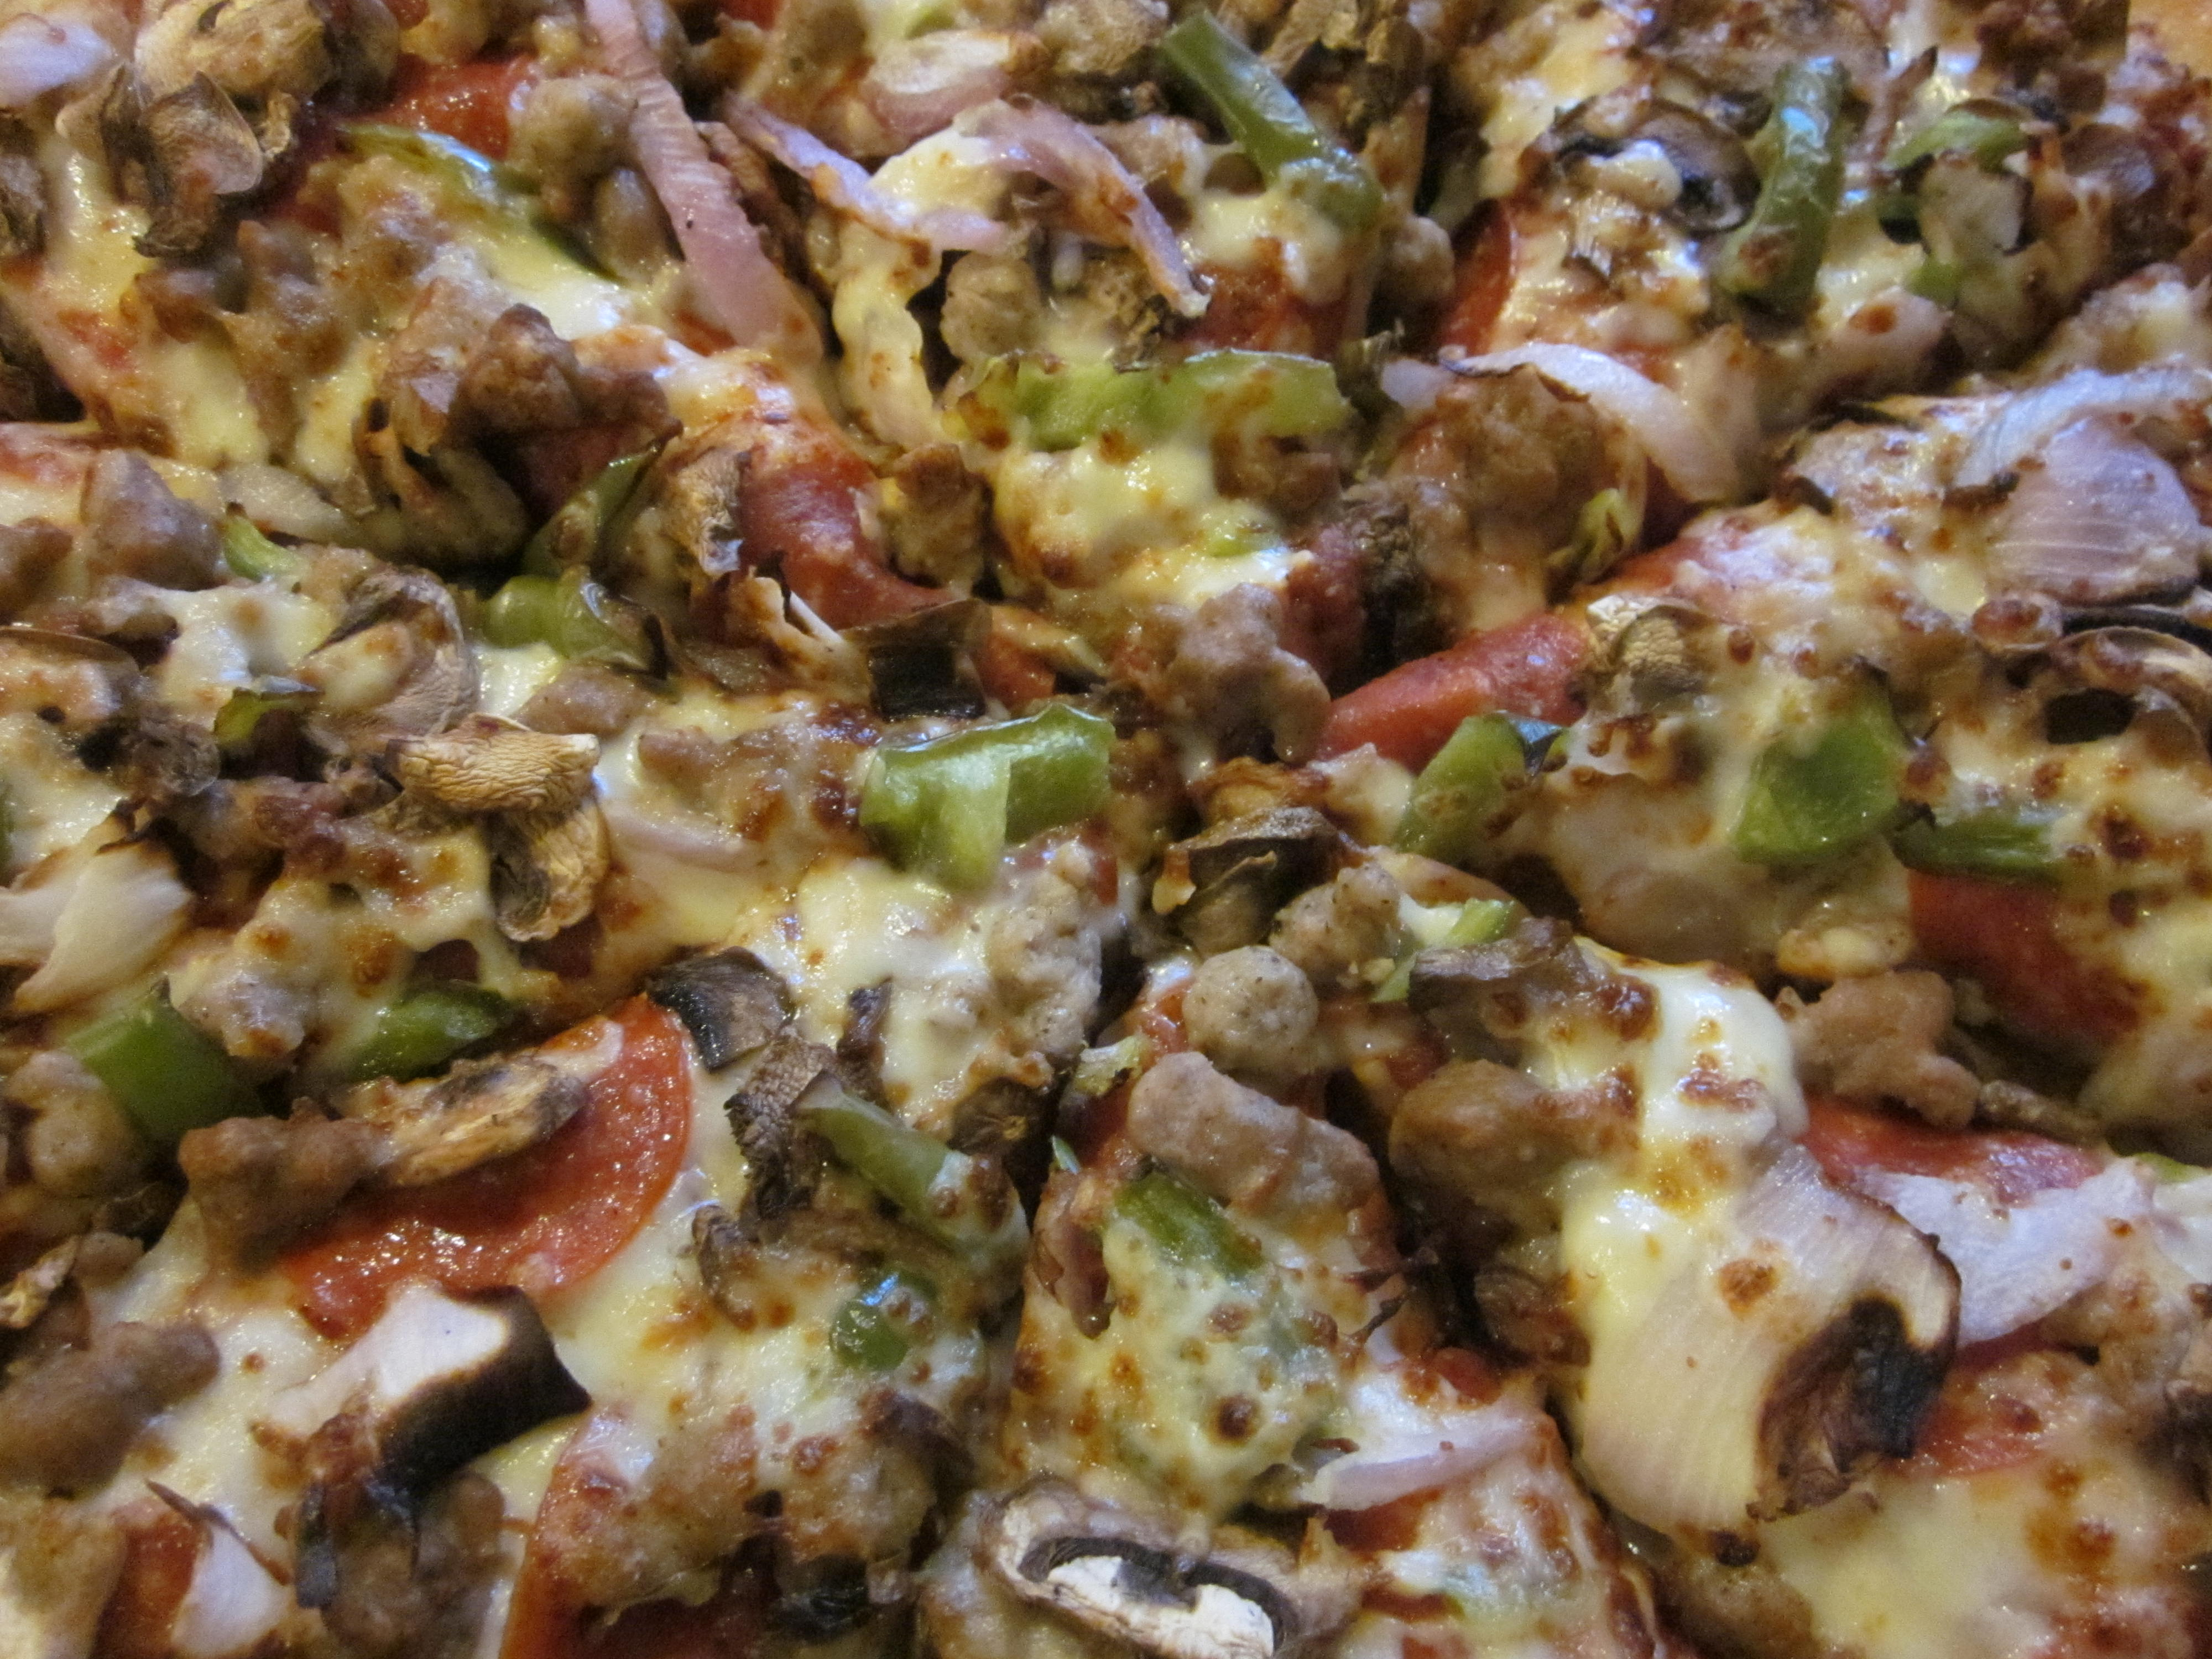 File:Pizza Hut Supreme pizza 1.JPG - Wikimedia Commons